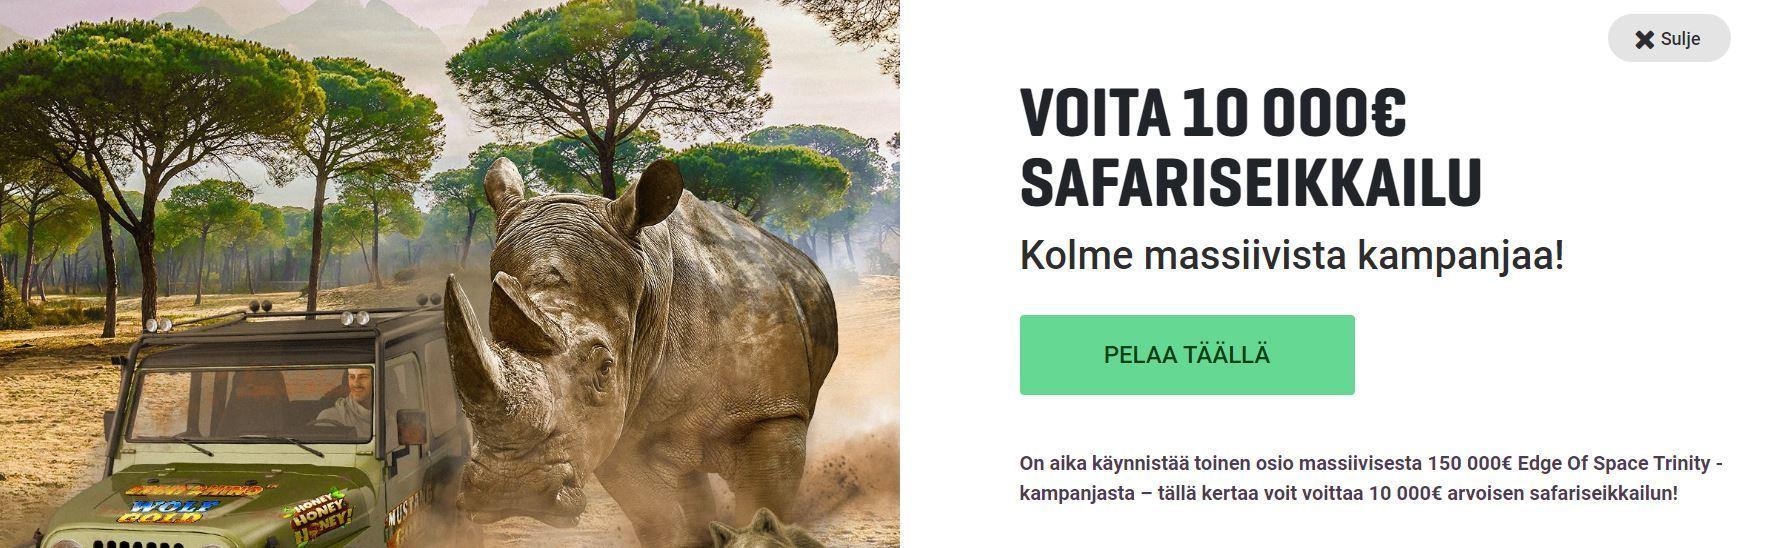 Guts - safarimatka